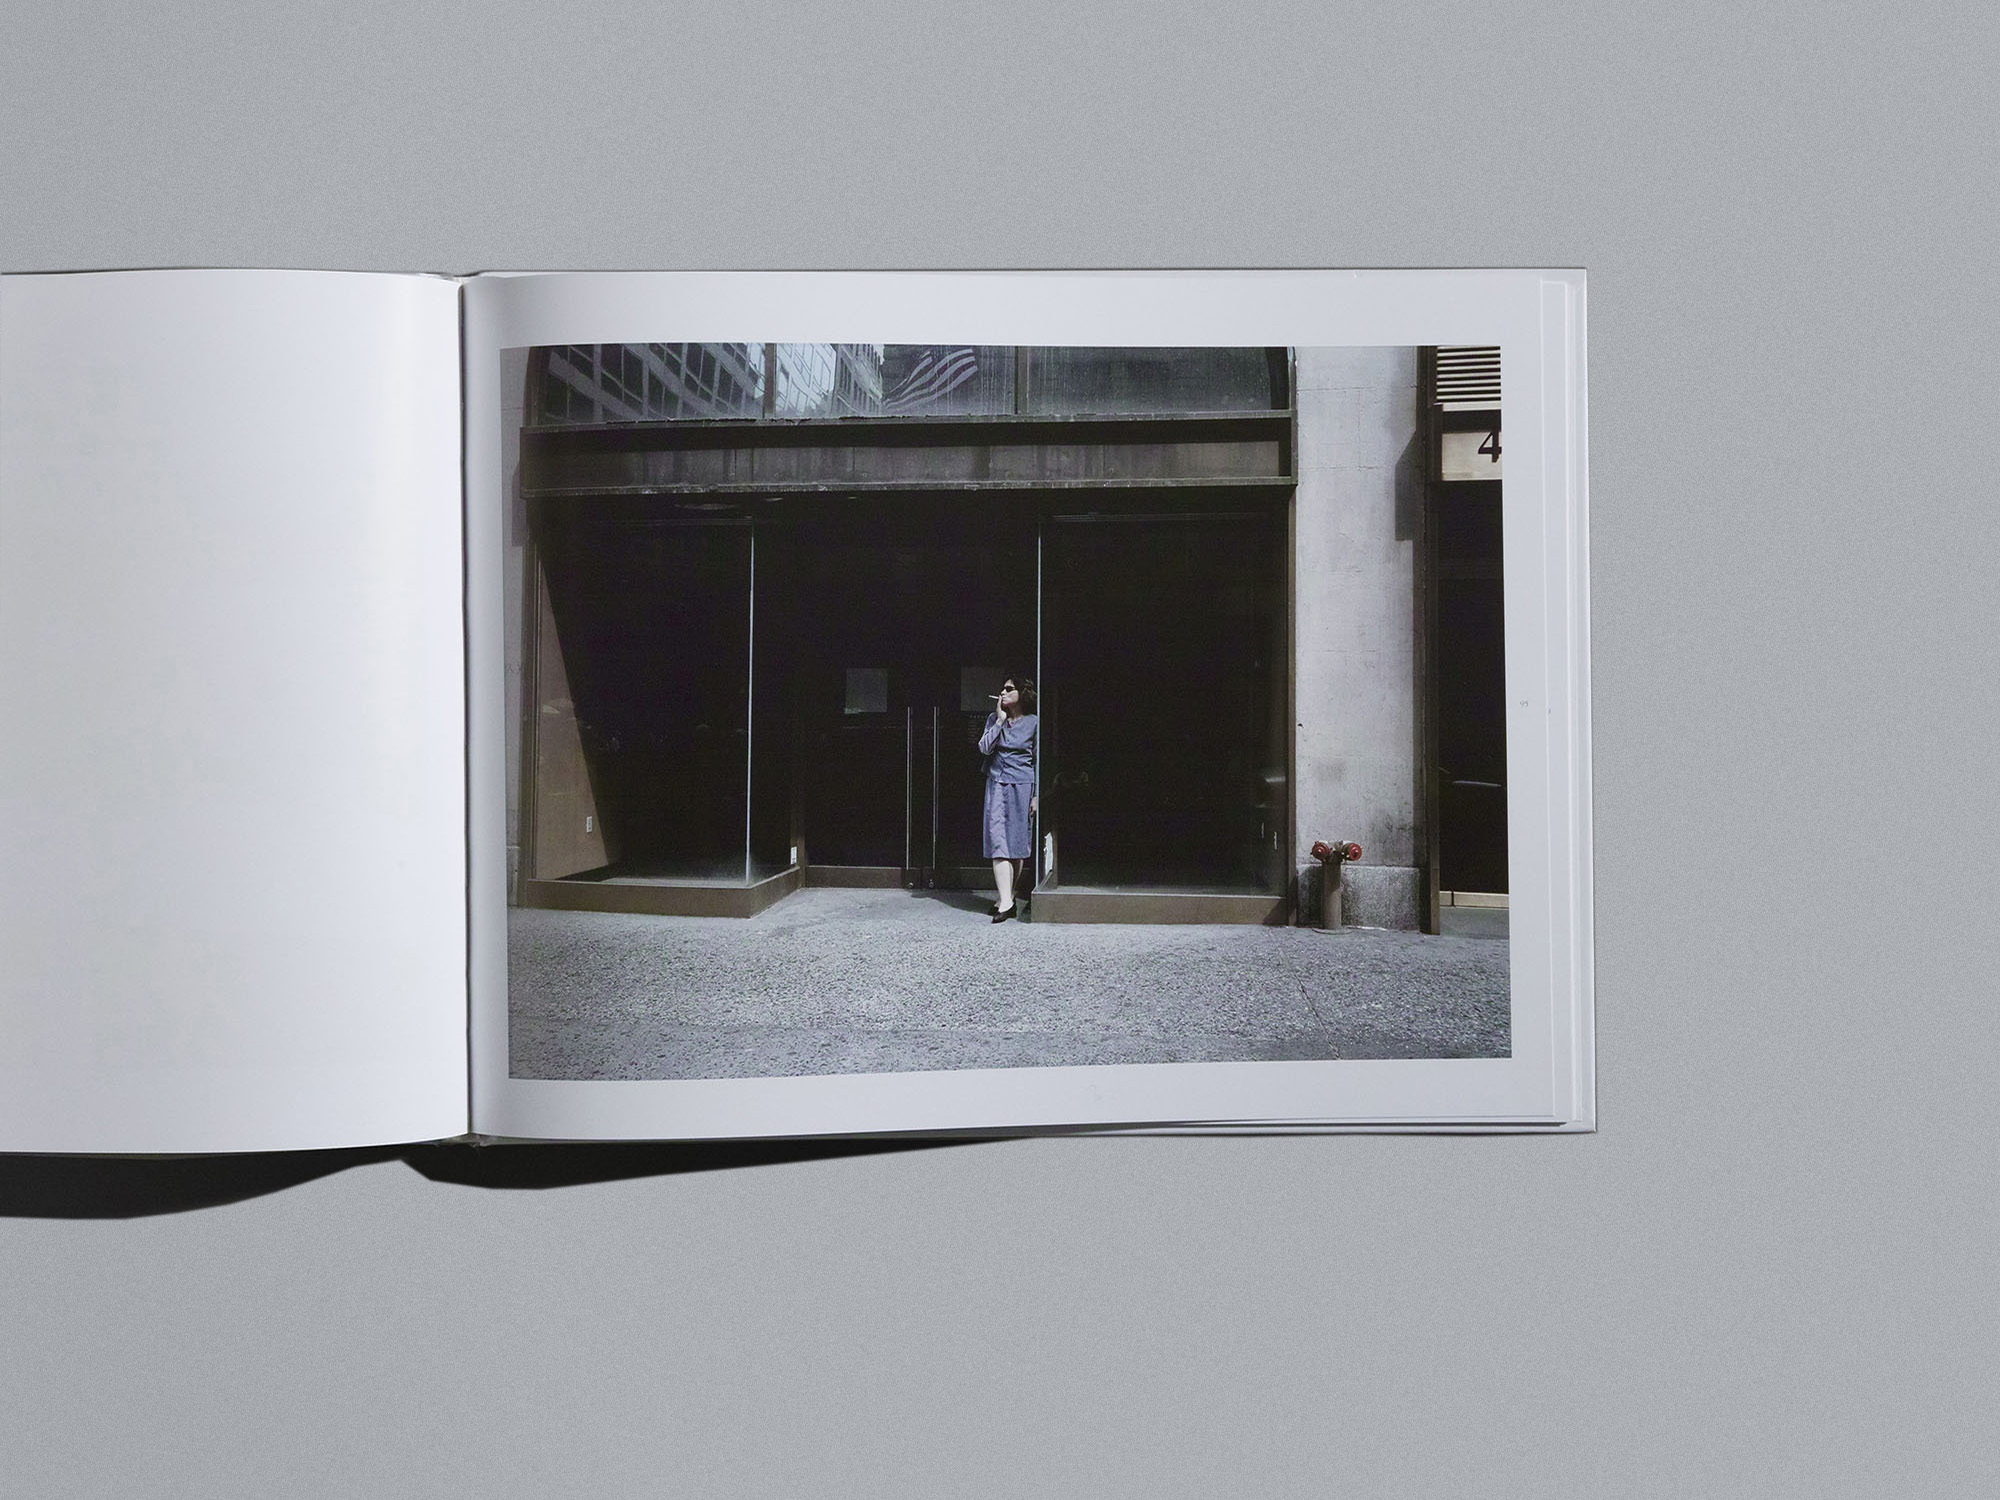 New York - 2005